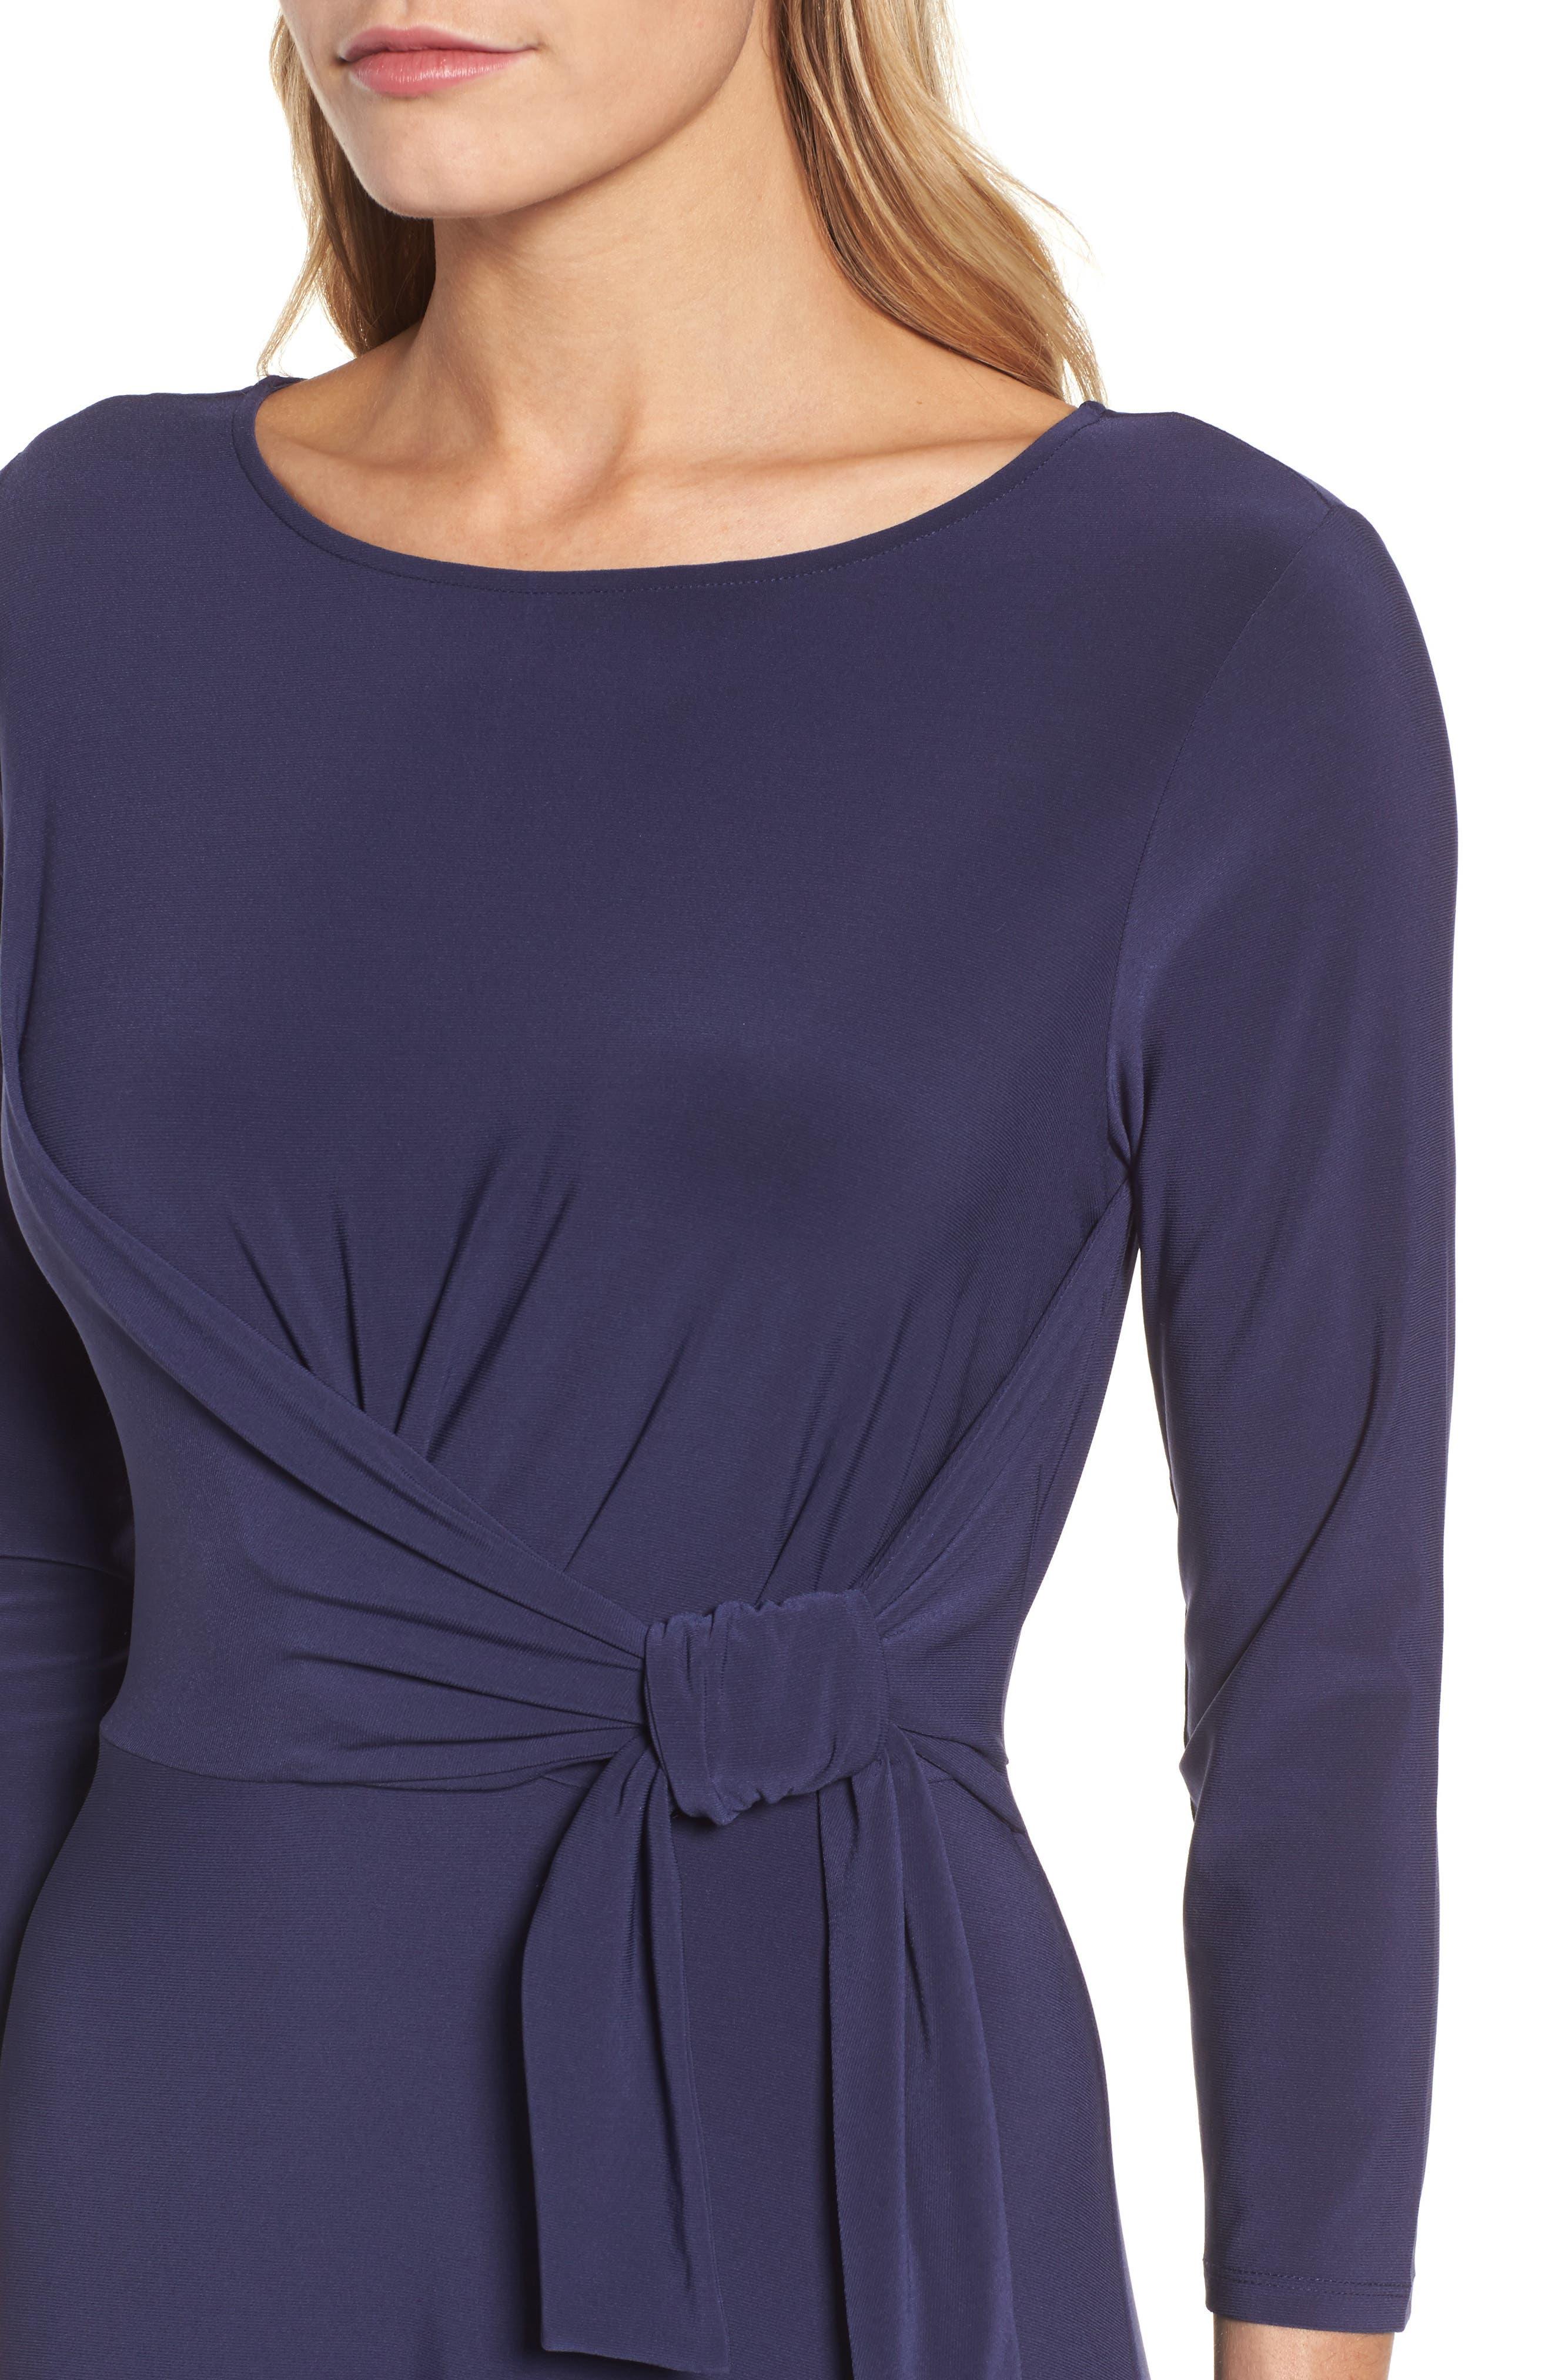 Cahus Faux Wrap Midi Dress,                             Alternate thumbnail 4, color,                             429